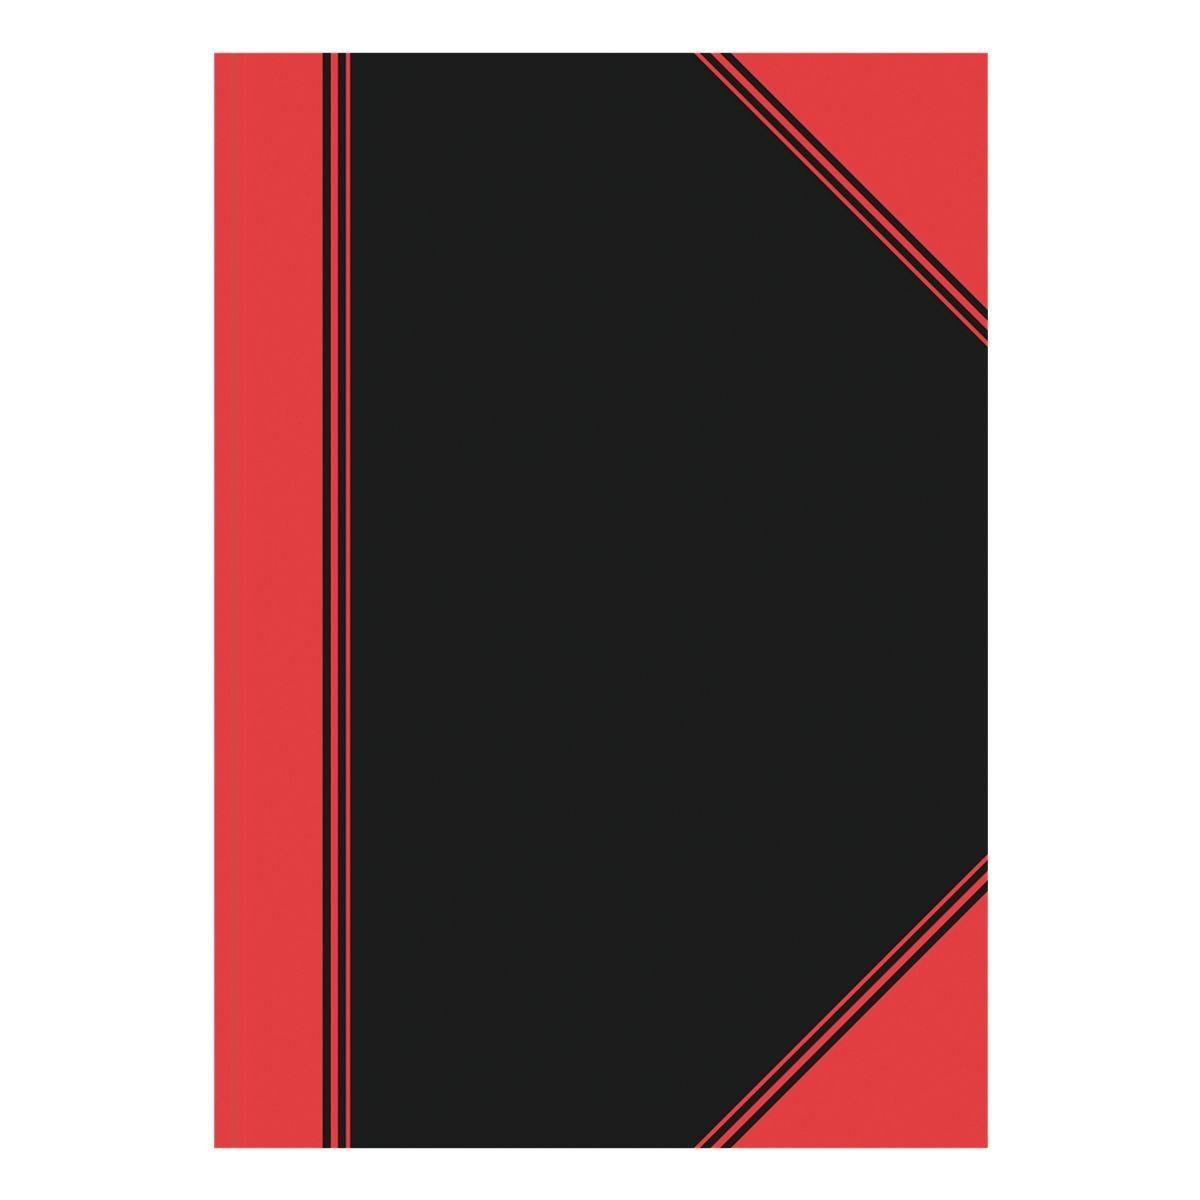 LANDRE Notizbuch 100302813 A5 liniert - 192 Seiten »Chinakladde«